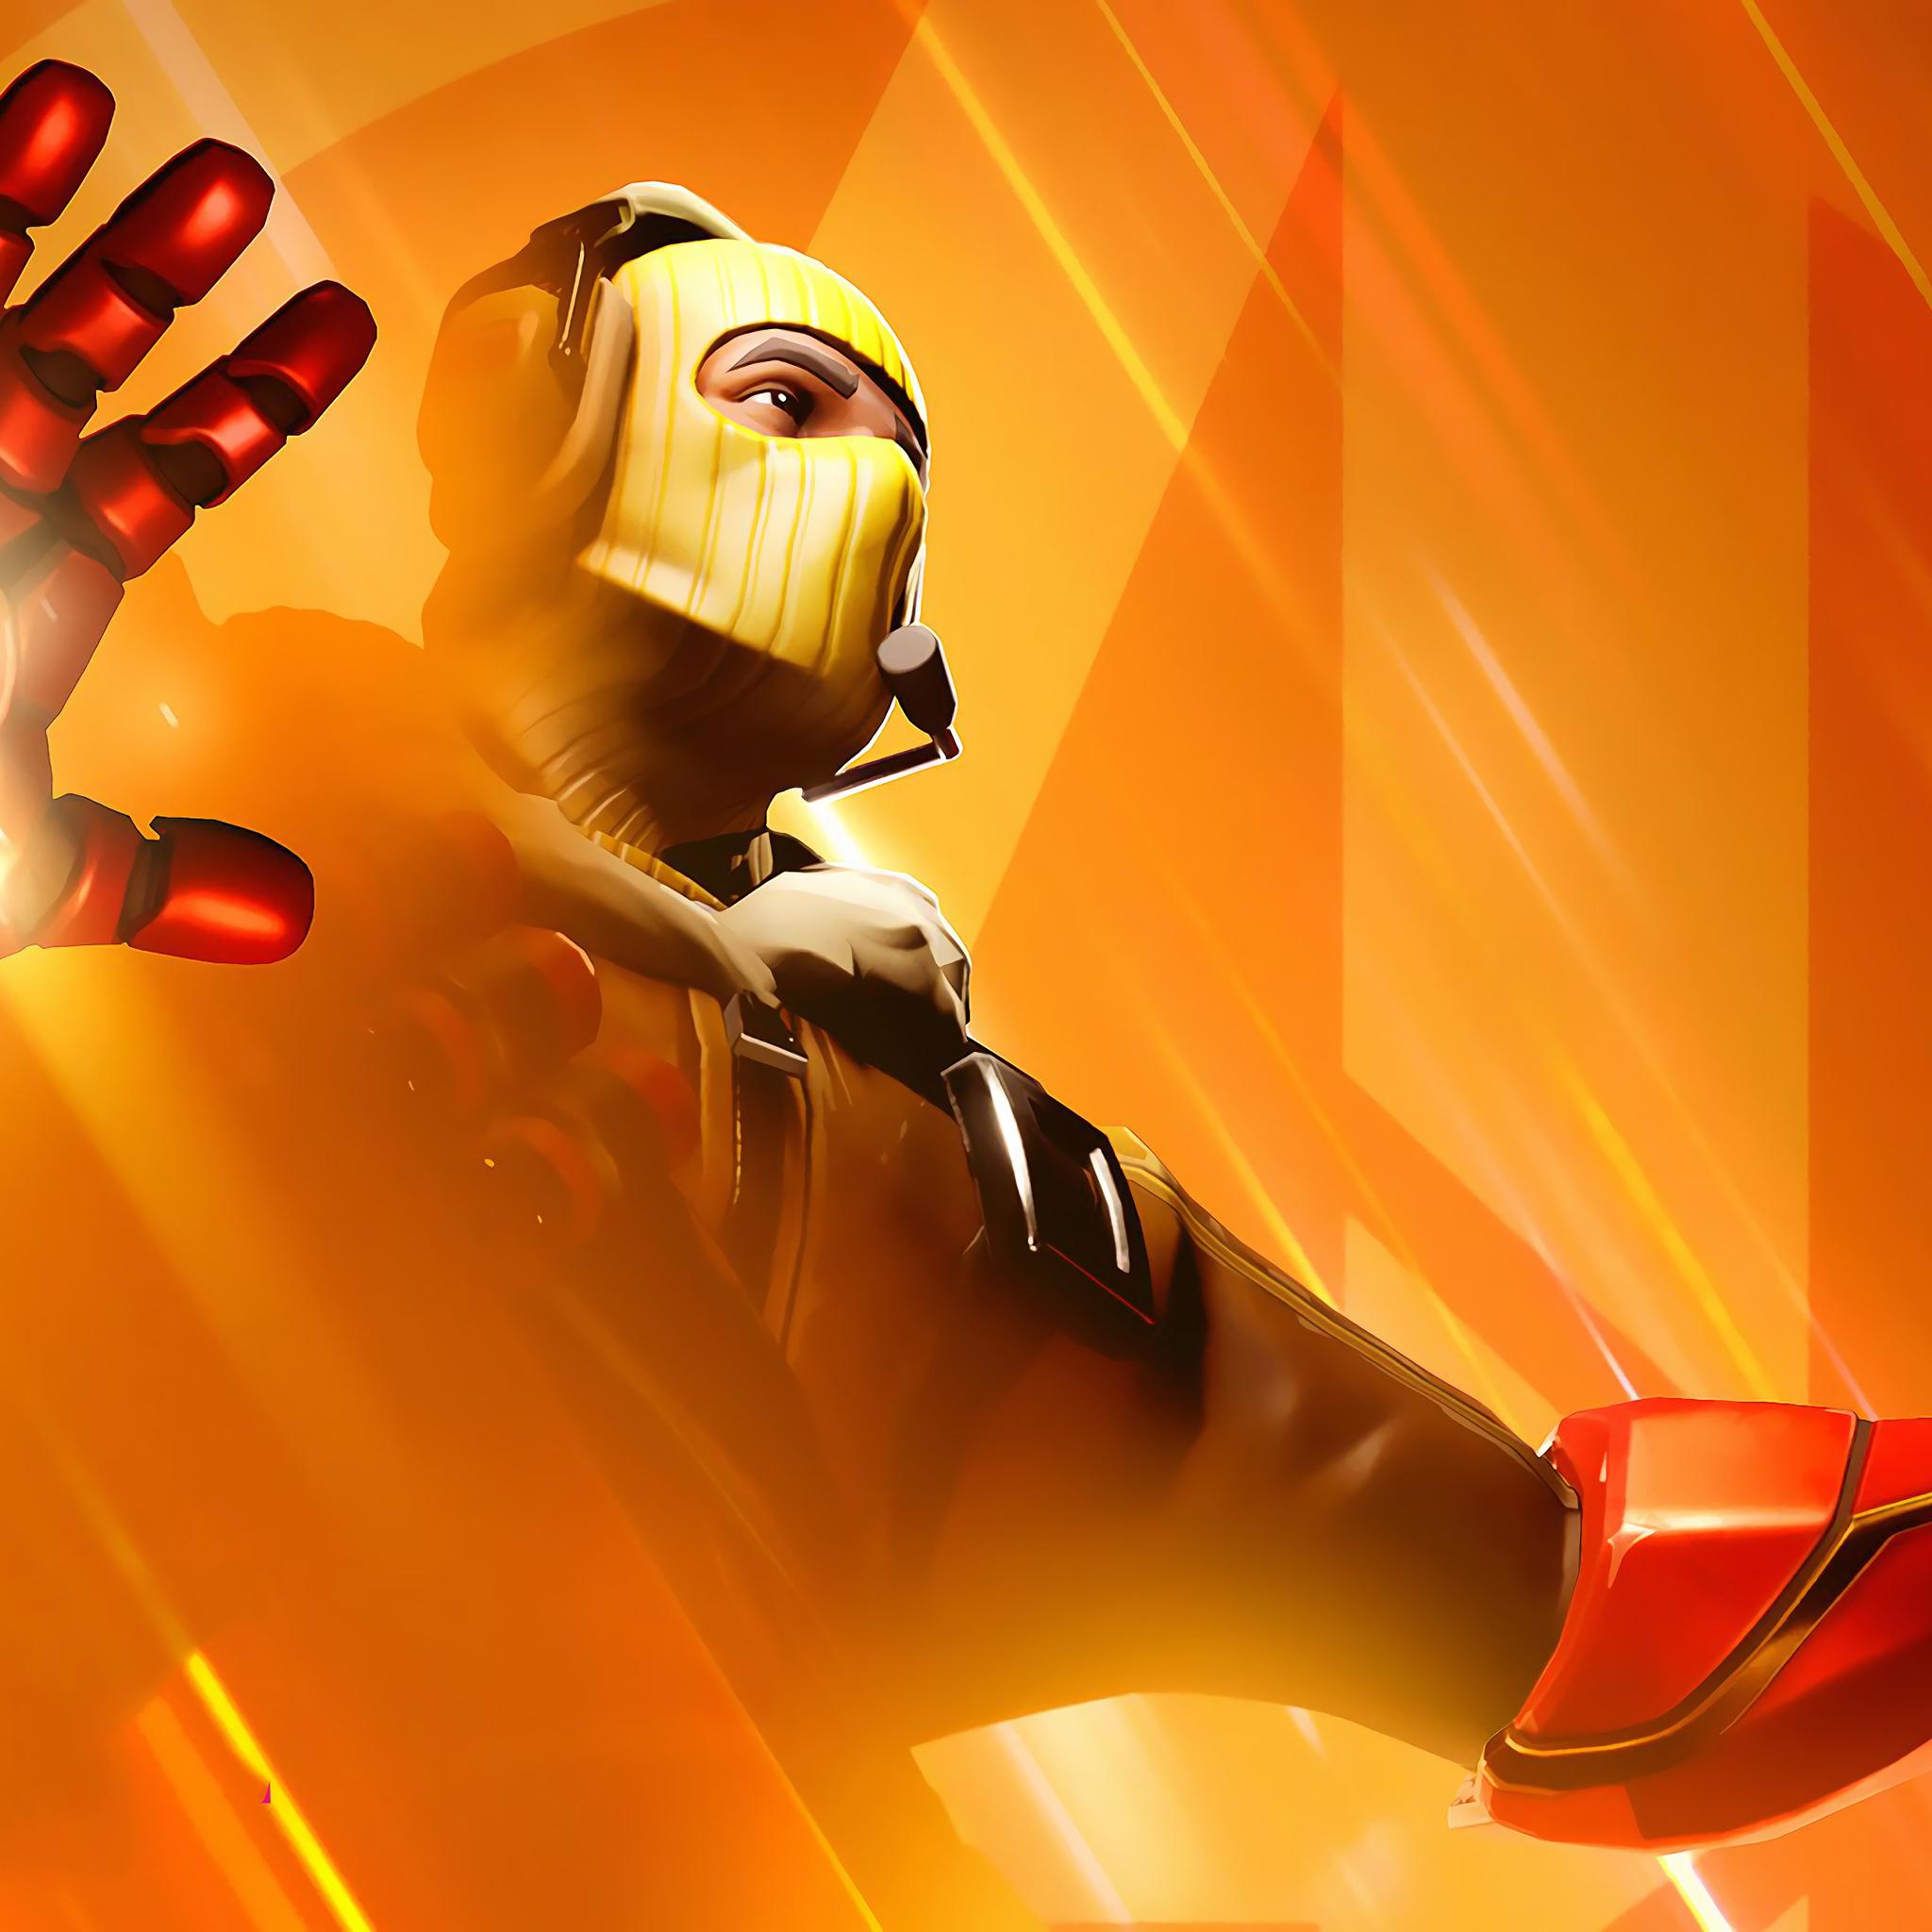 2048x2048 Fortnite Raptor Iron Man Avengers Endgame Ipad